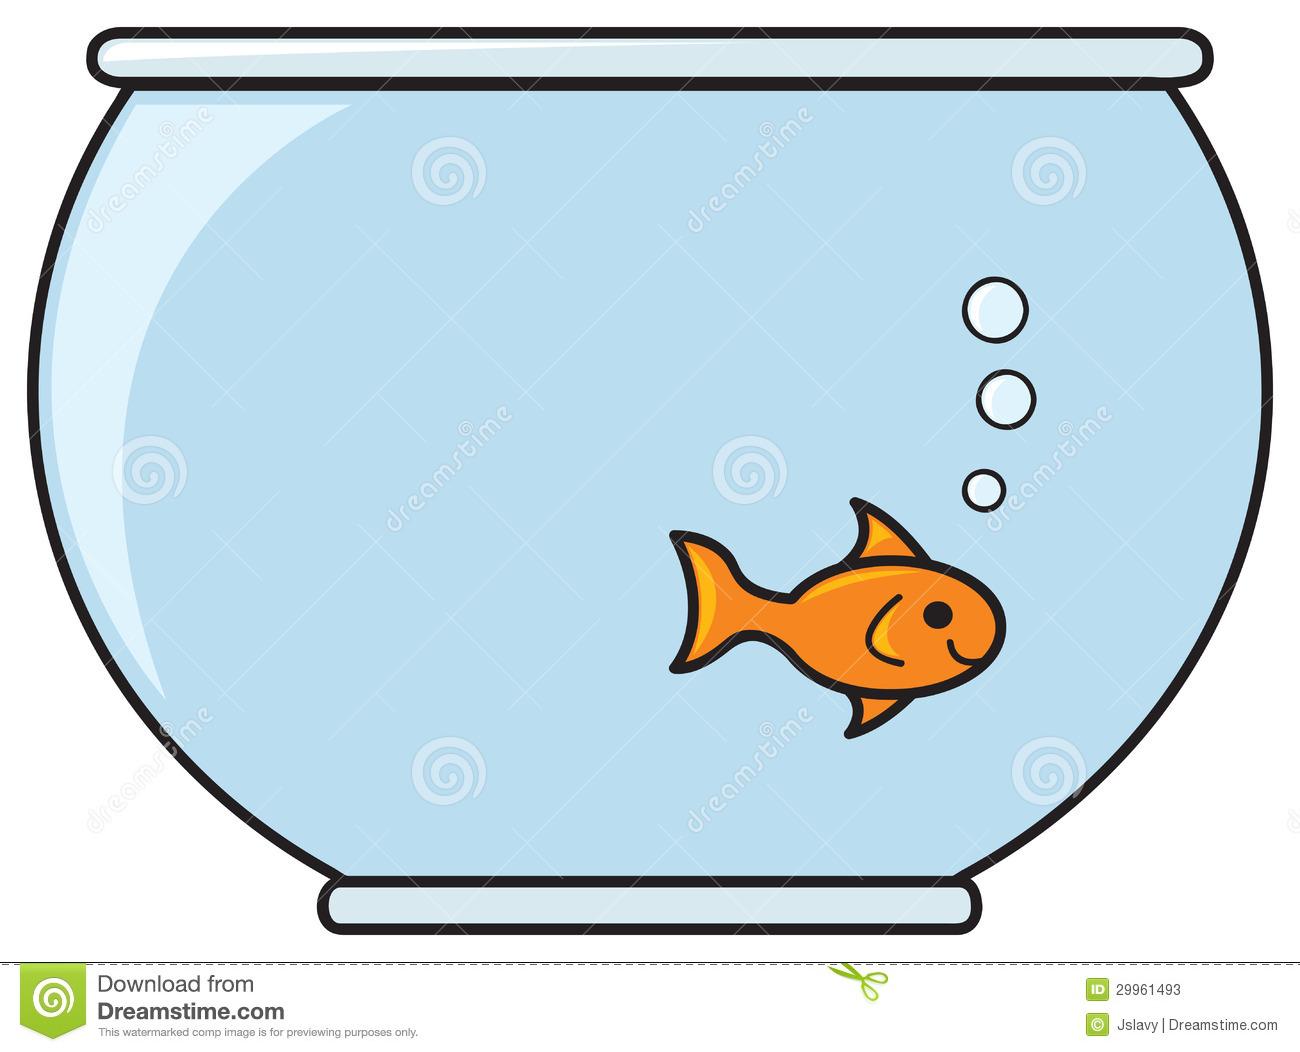 Aquarium clipart animated. Free download best on